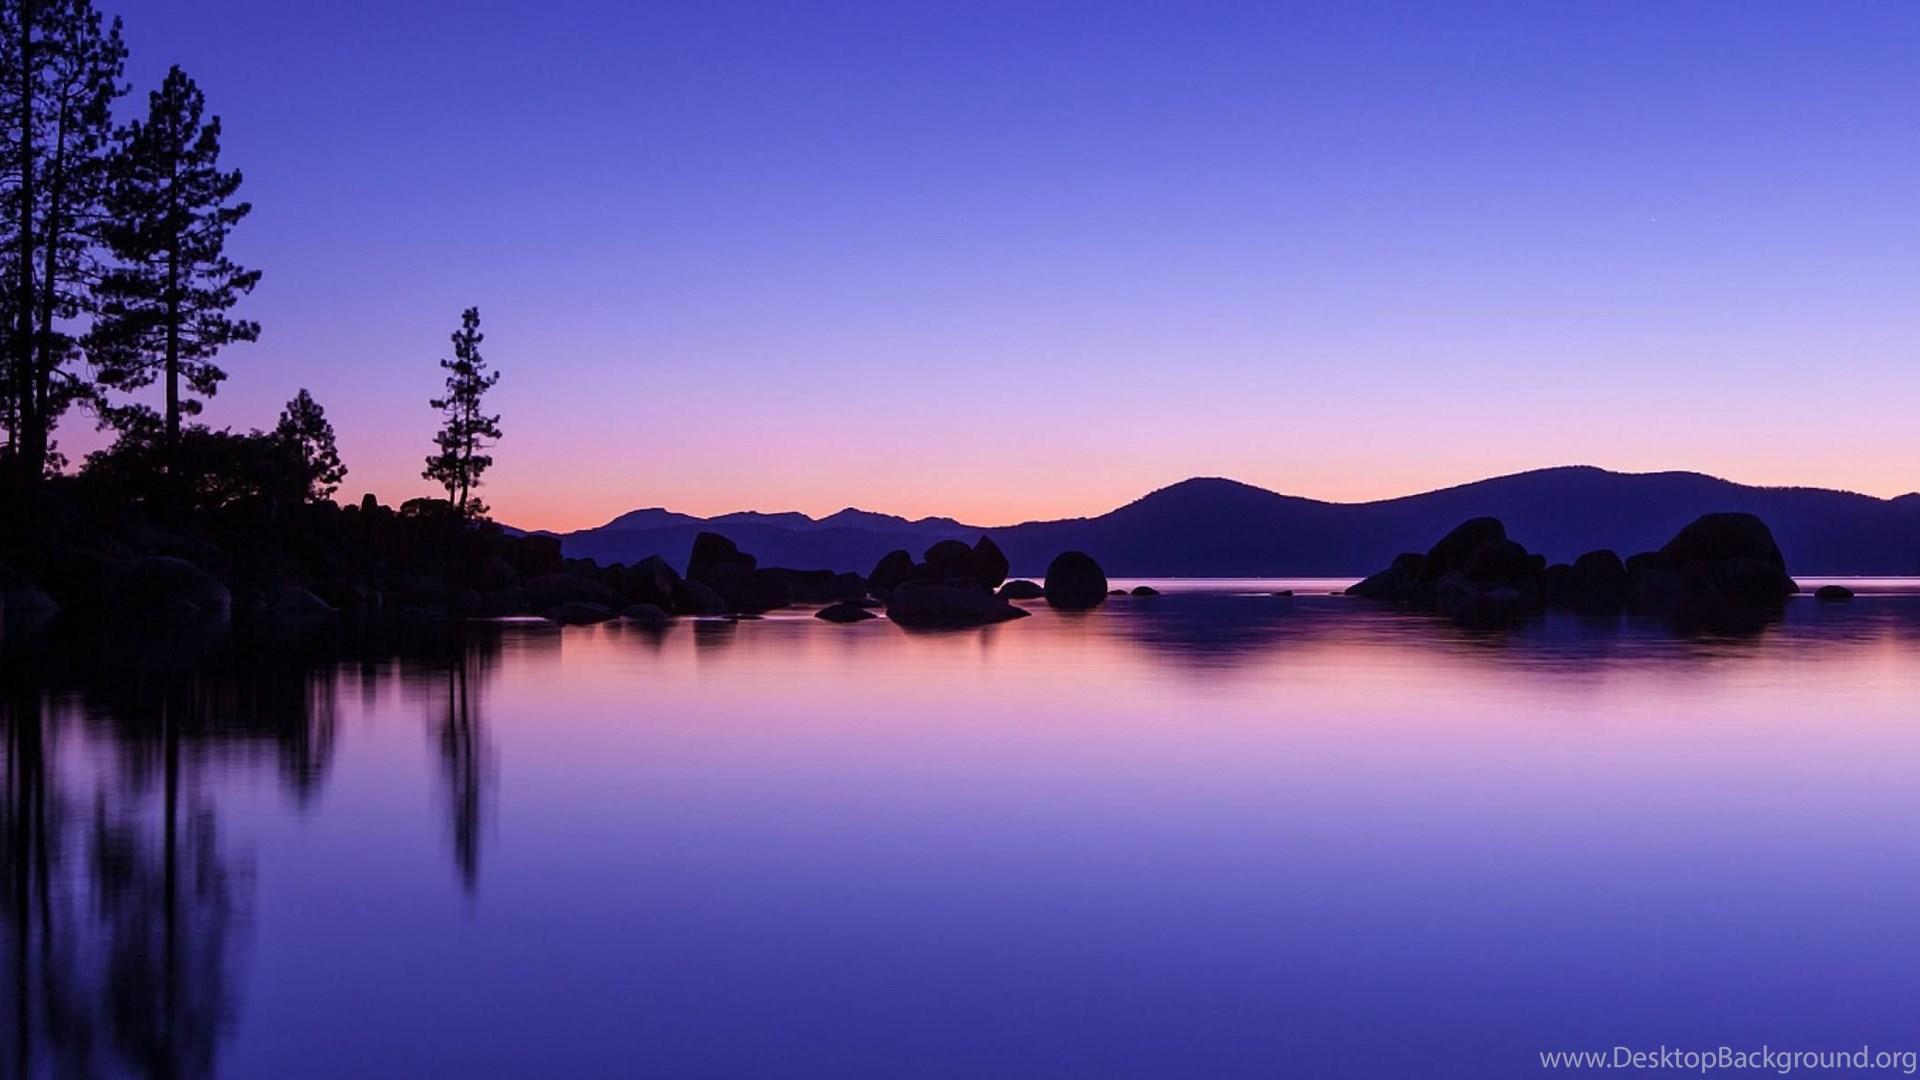 Download Wallpapers Romantic Evening, Lake Tahoe